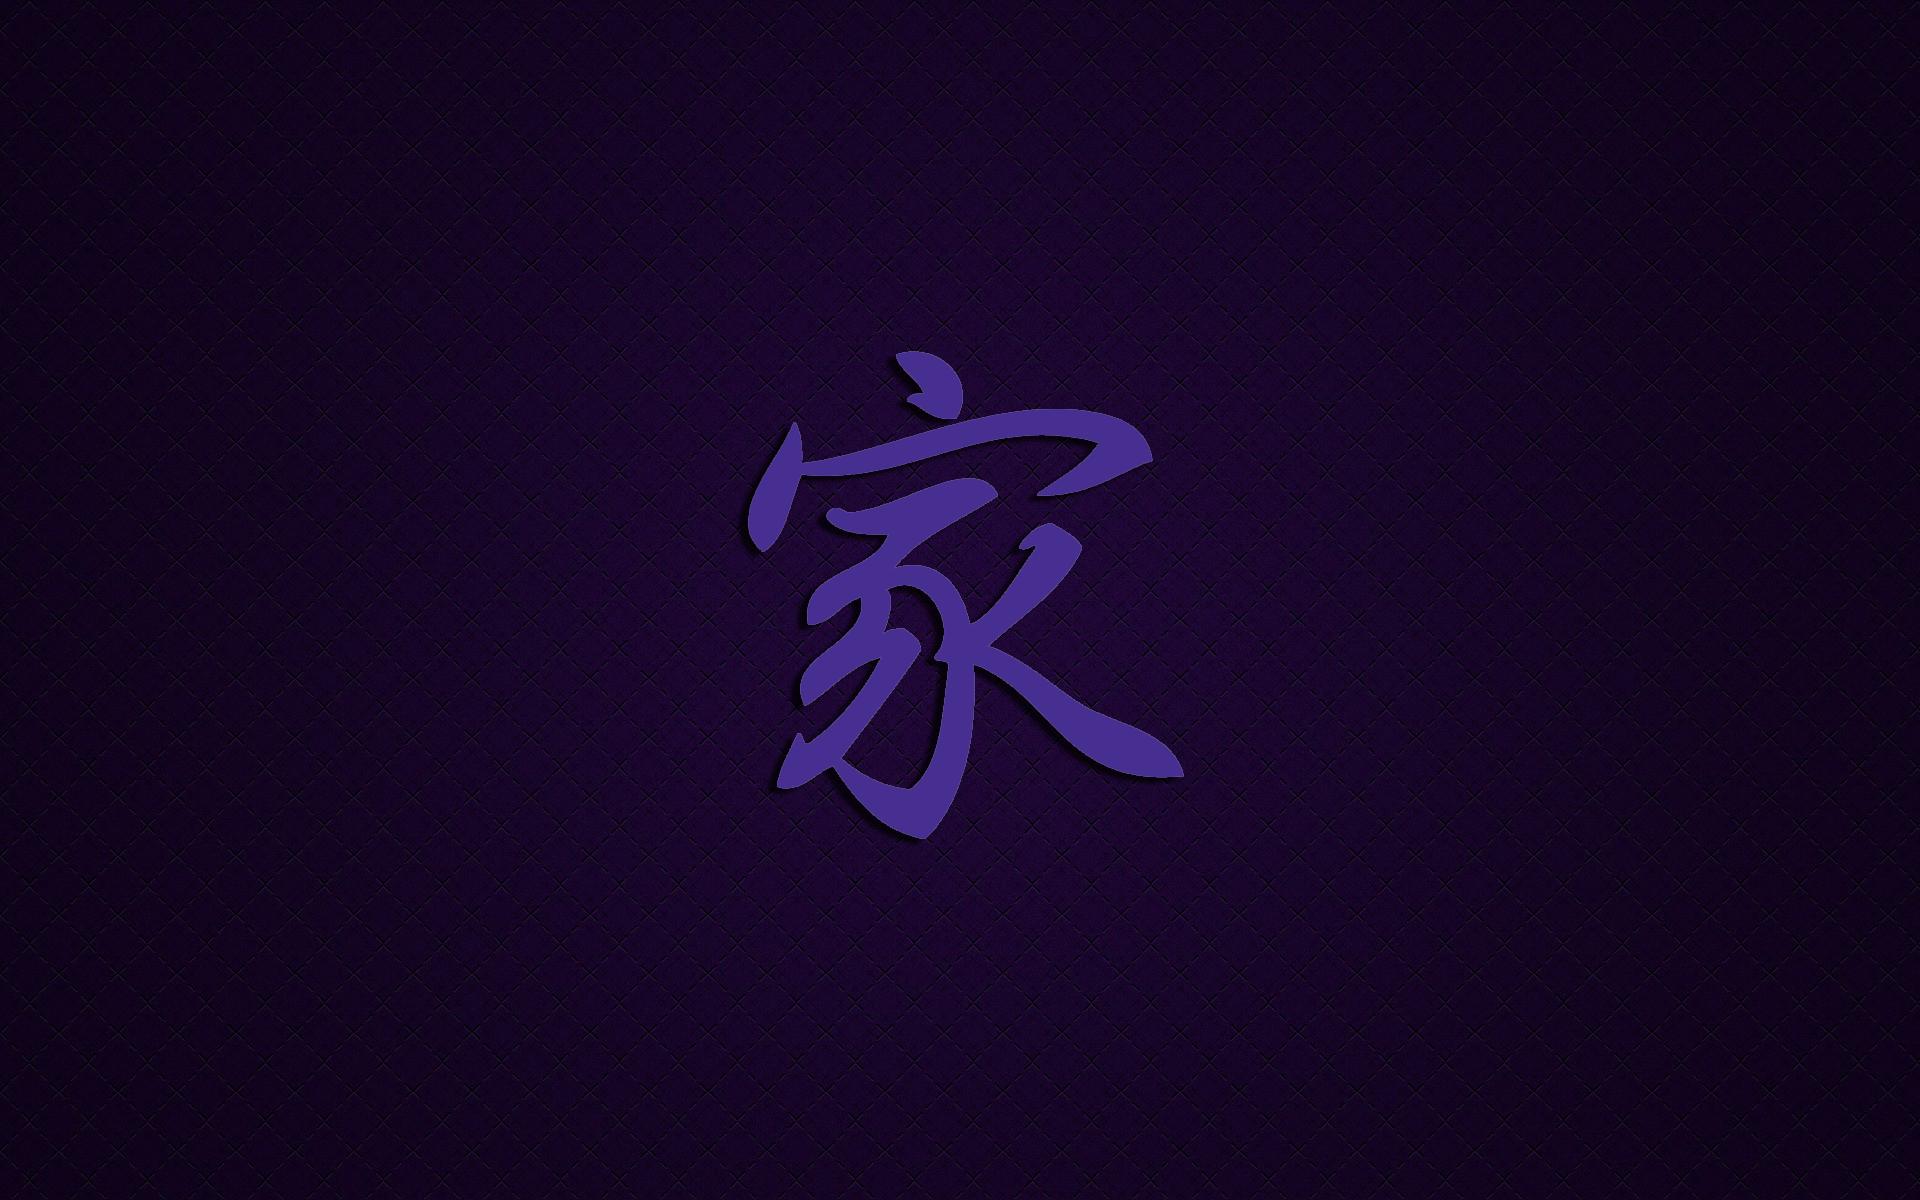 Chinese character wallpaper wallpapersafari download symbol chinese wallpaper 1920x1200 wallpoper buycottarizona